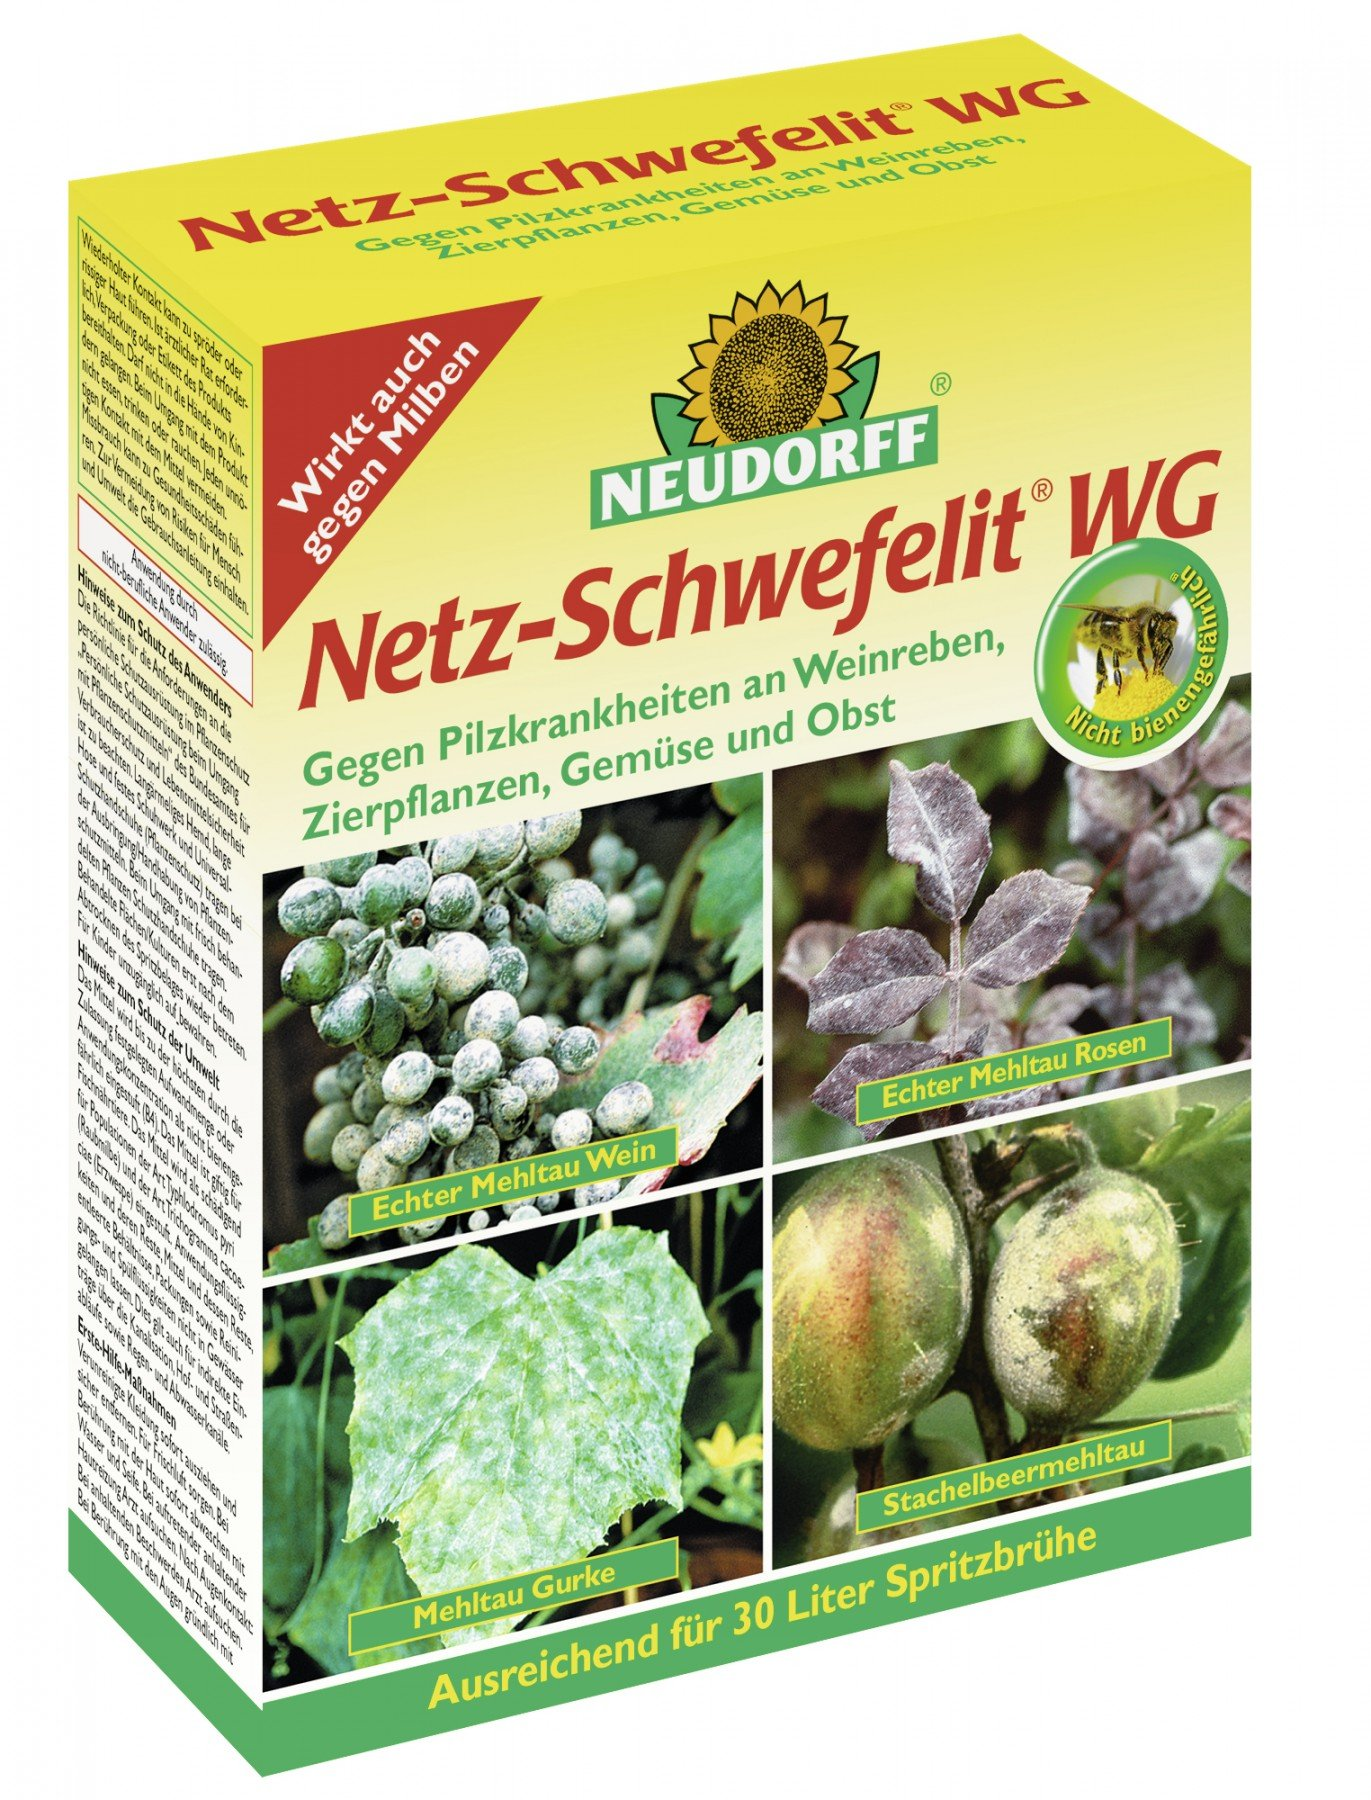 Neudorff Netz-Schwefelit® WG, 75 g product image